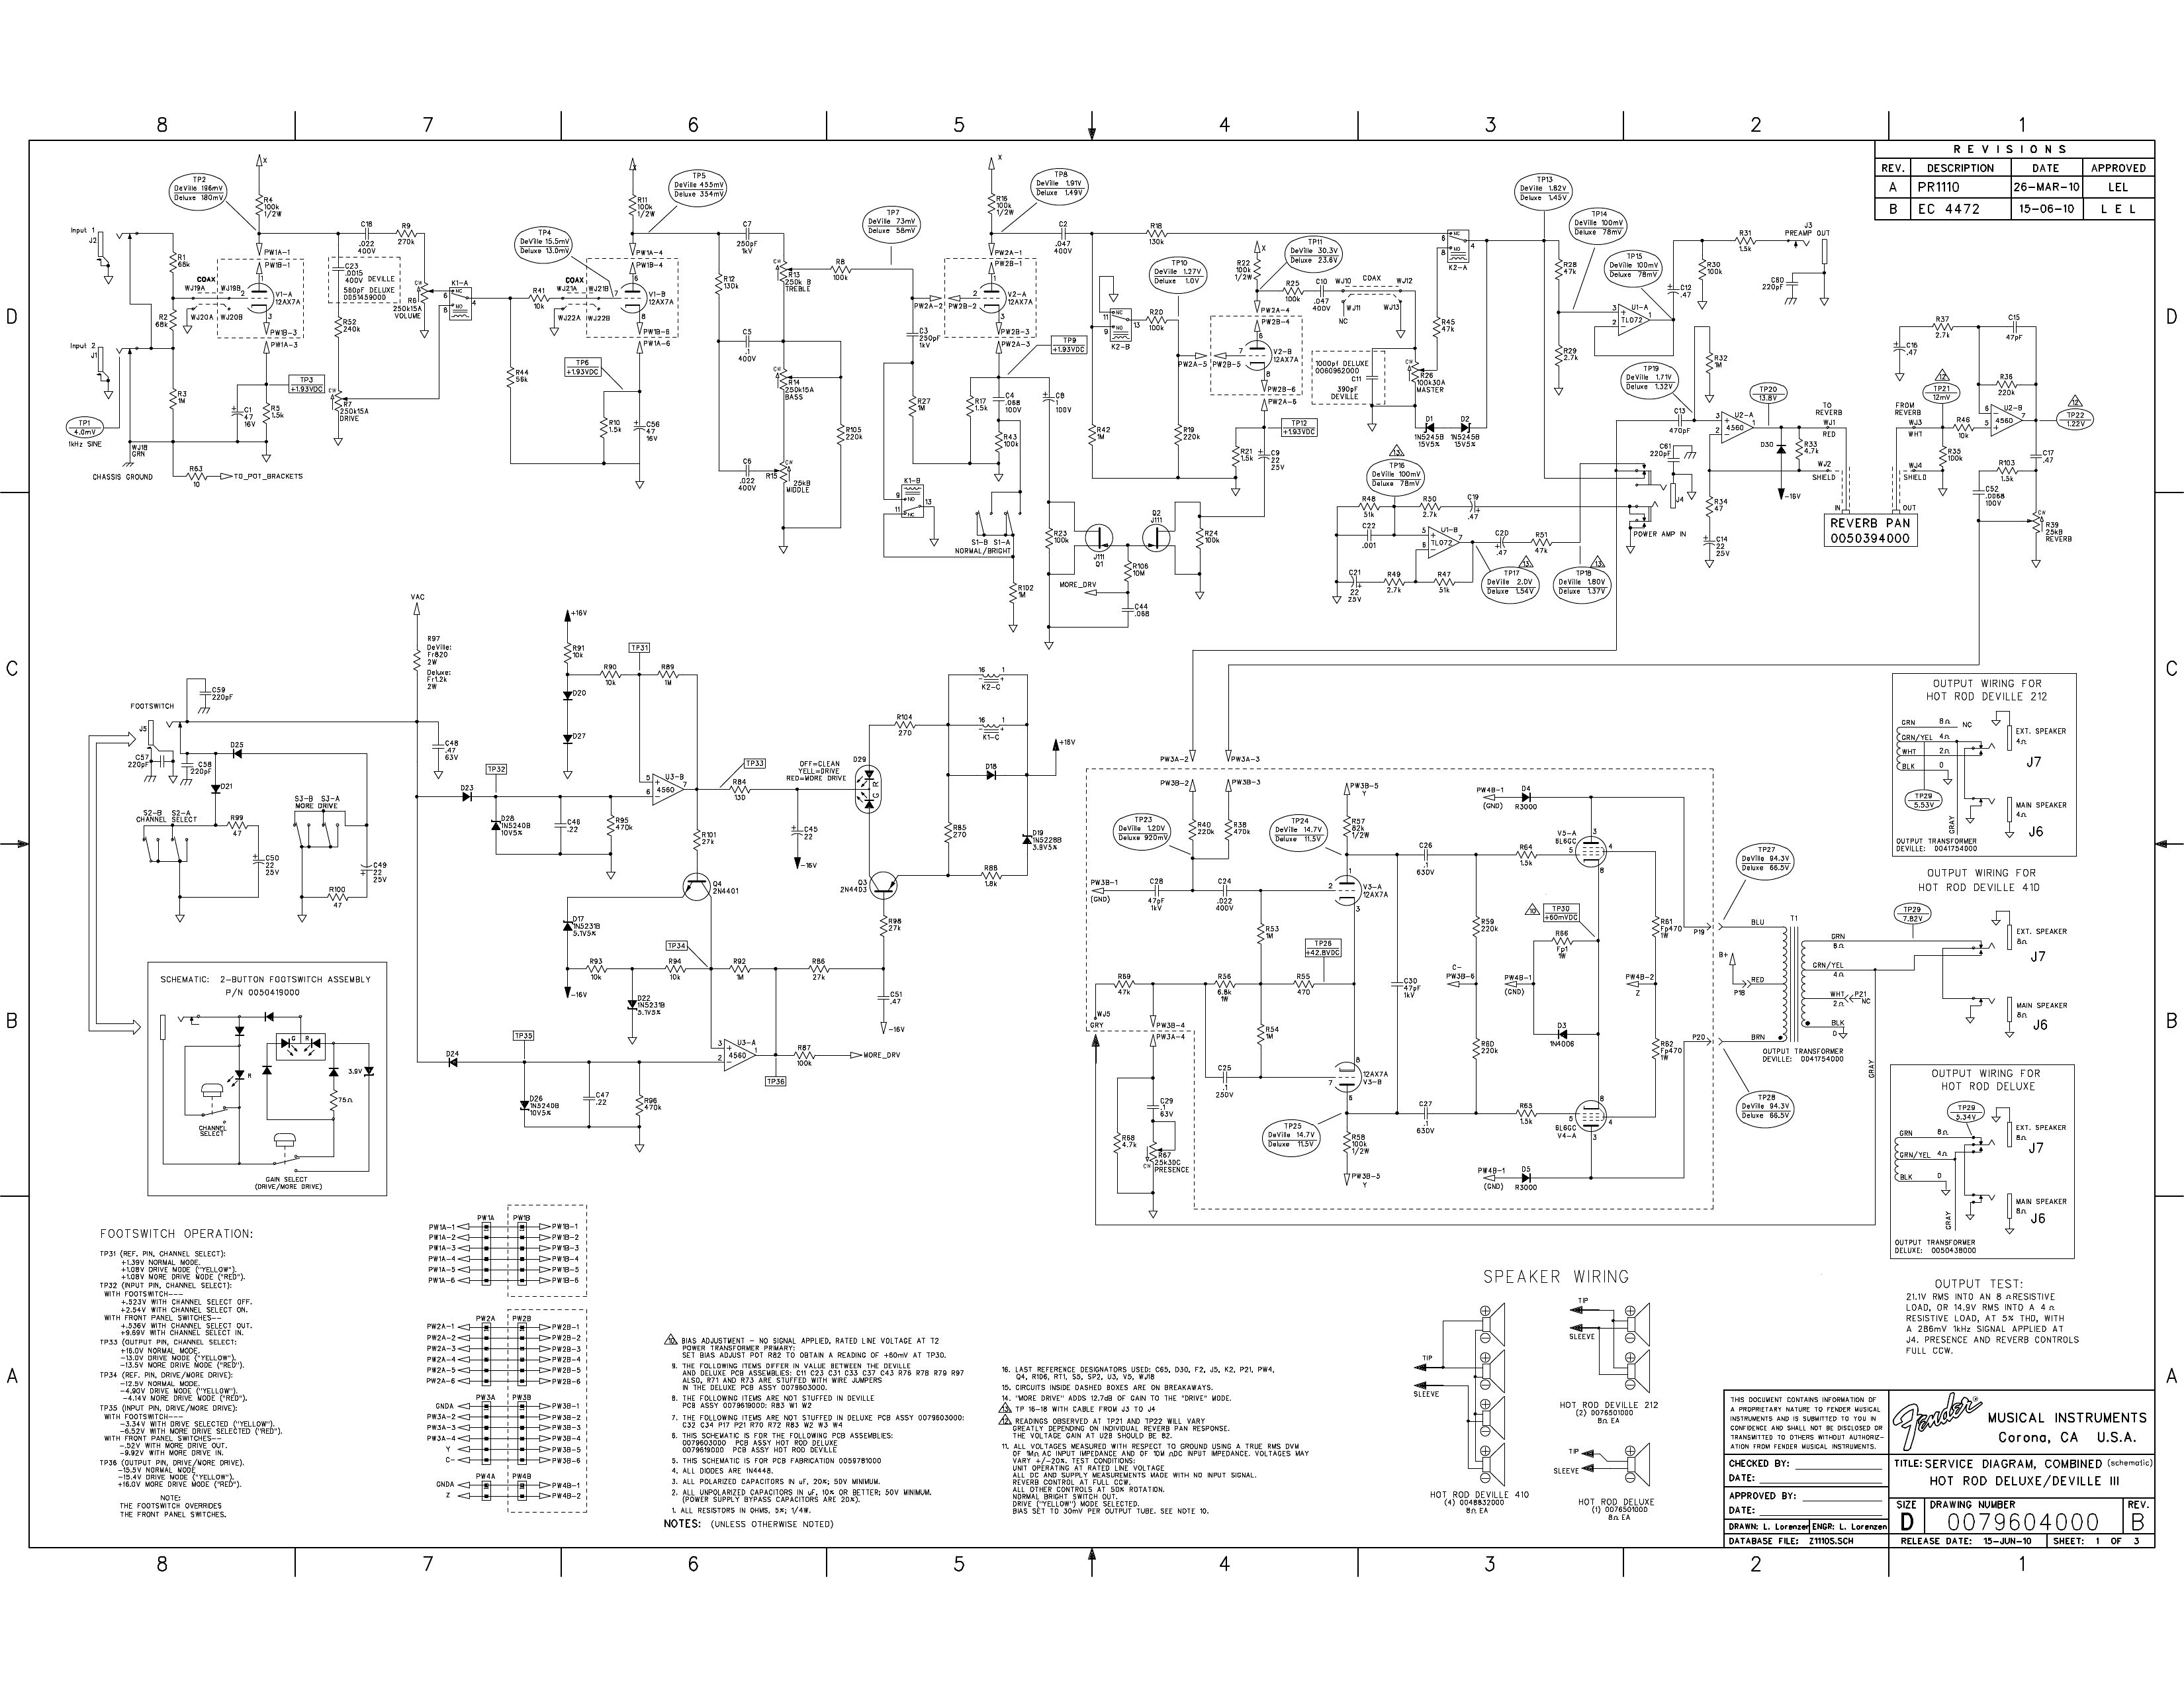 RYRA Klon Klone users? | Page 2 | My Les Paul Forum Dam Meathead Schematic on